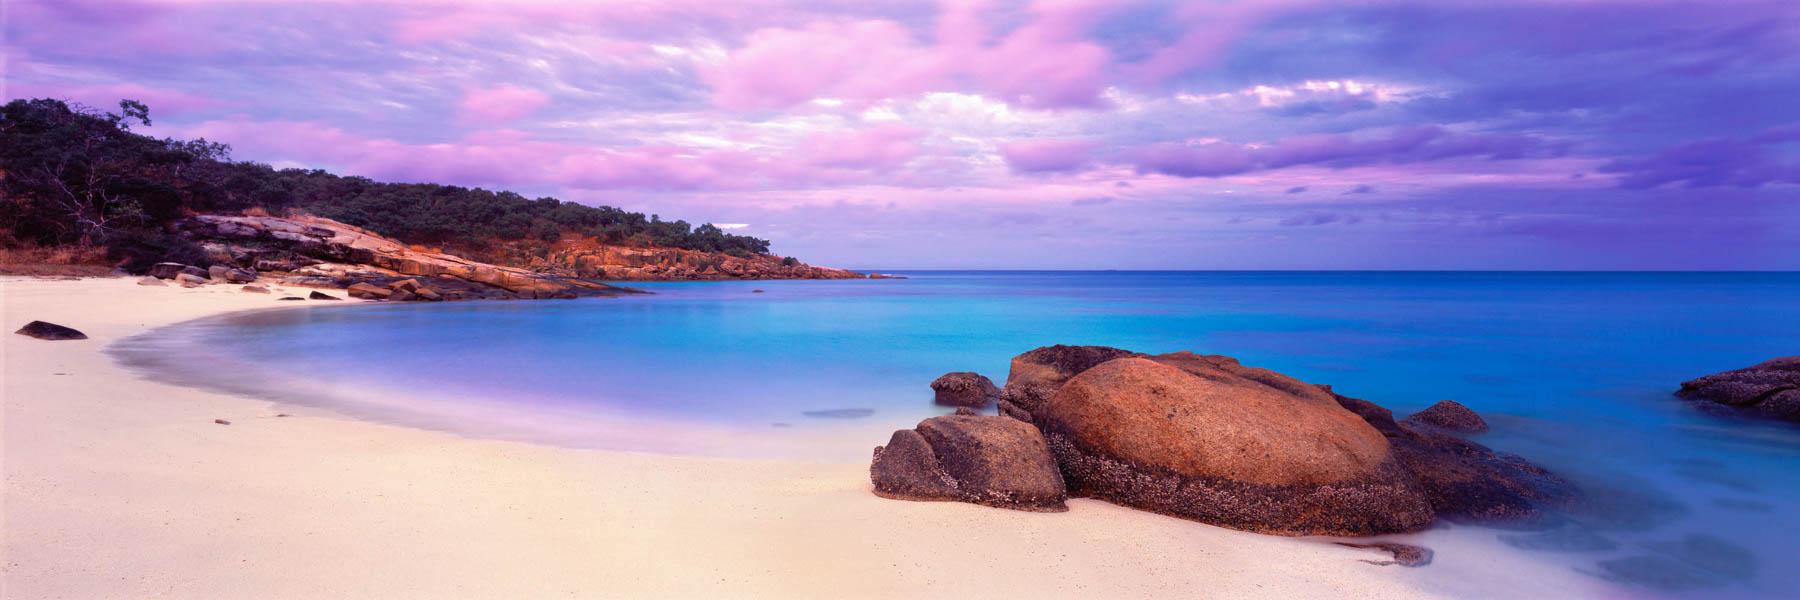 Pastel twilight over Lizard Island, Qld, Australia.